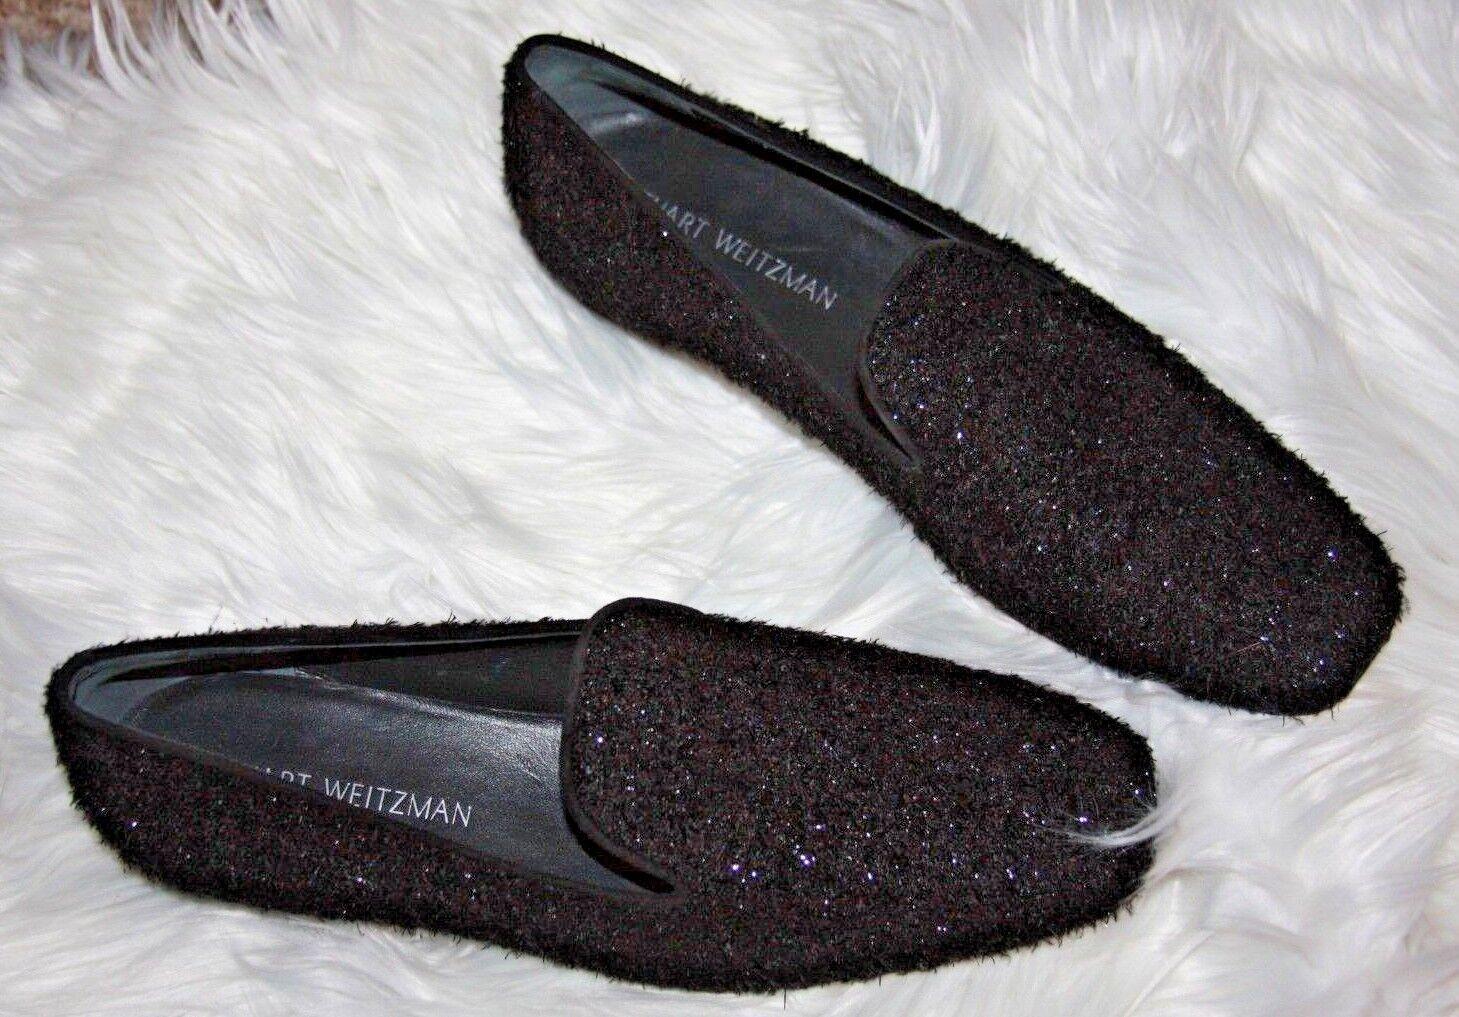 a56fac4ae96 sz 5 Tory Burch Caroline Nude Patent Leather Elastic Trim Ballerina Flat  Shoes